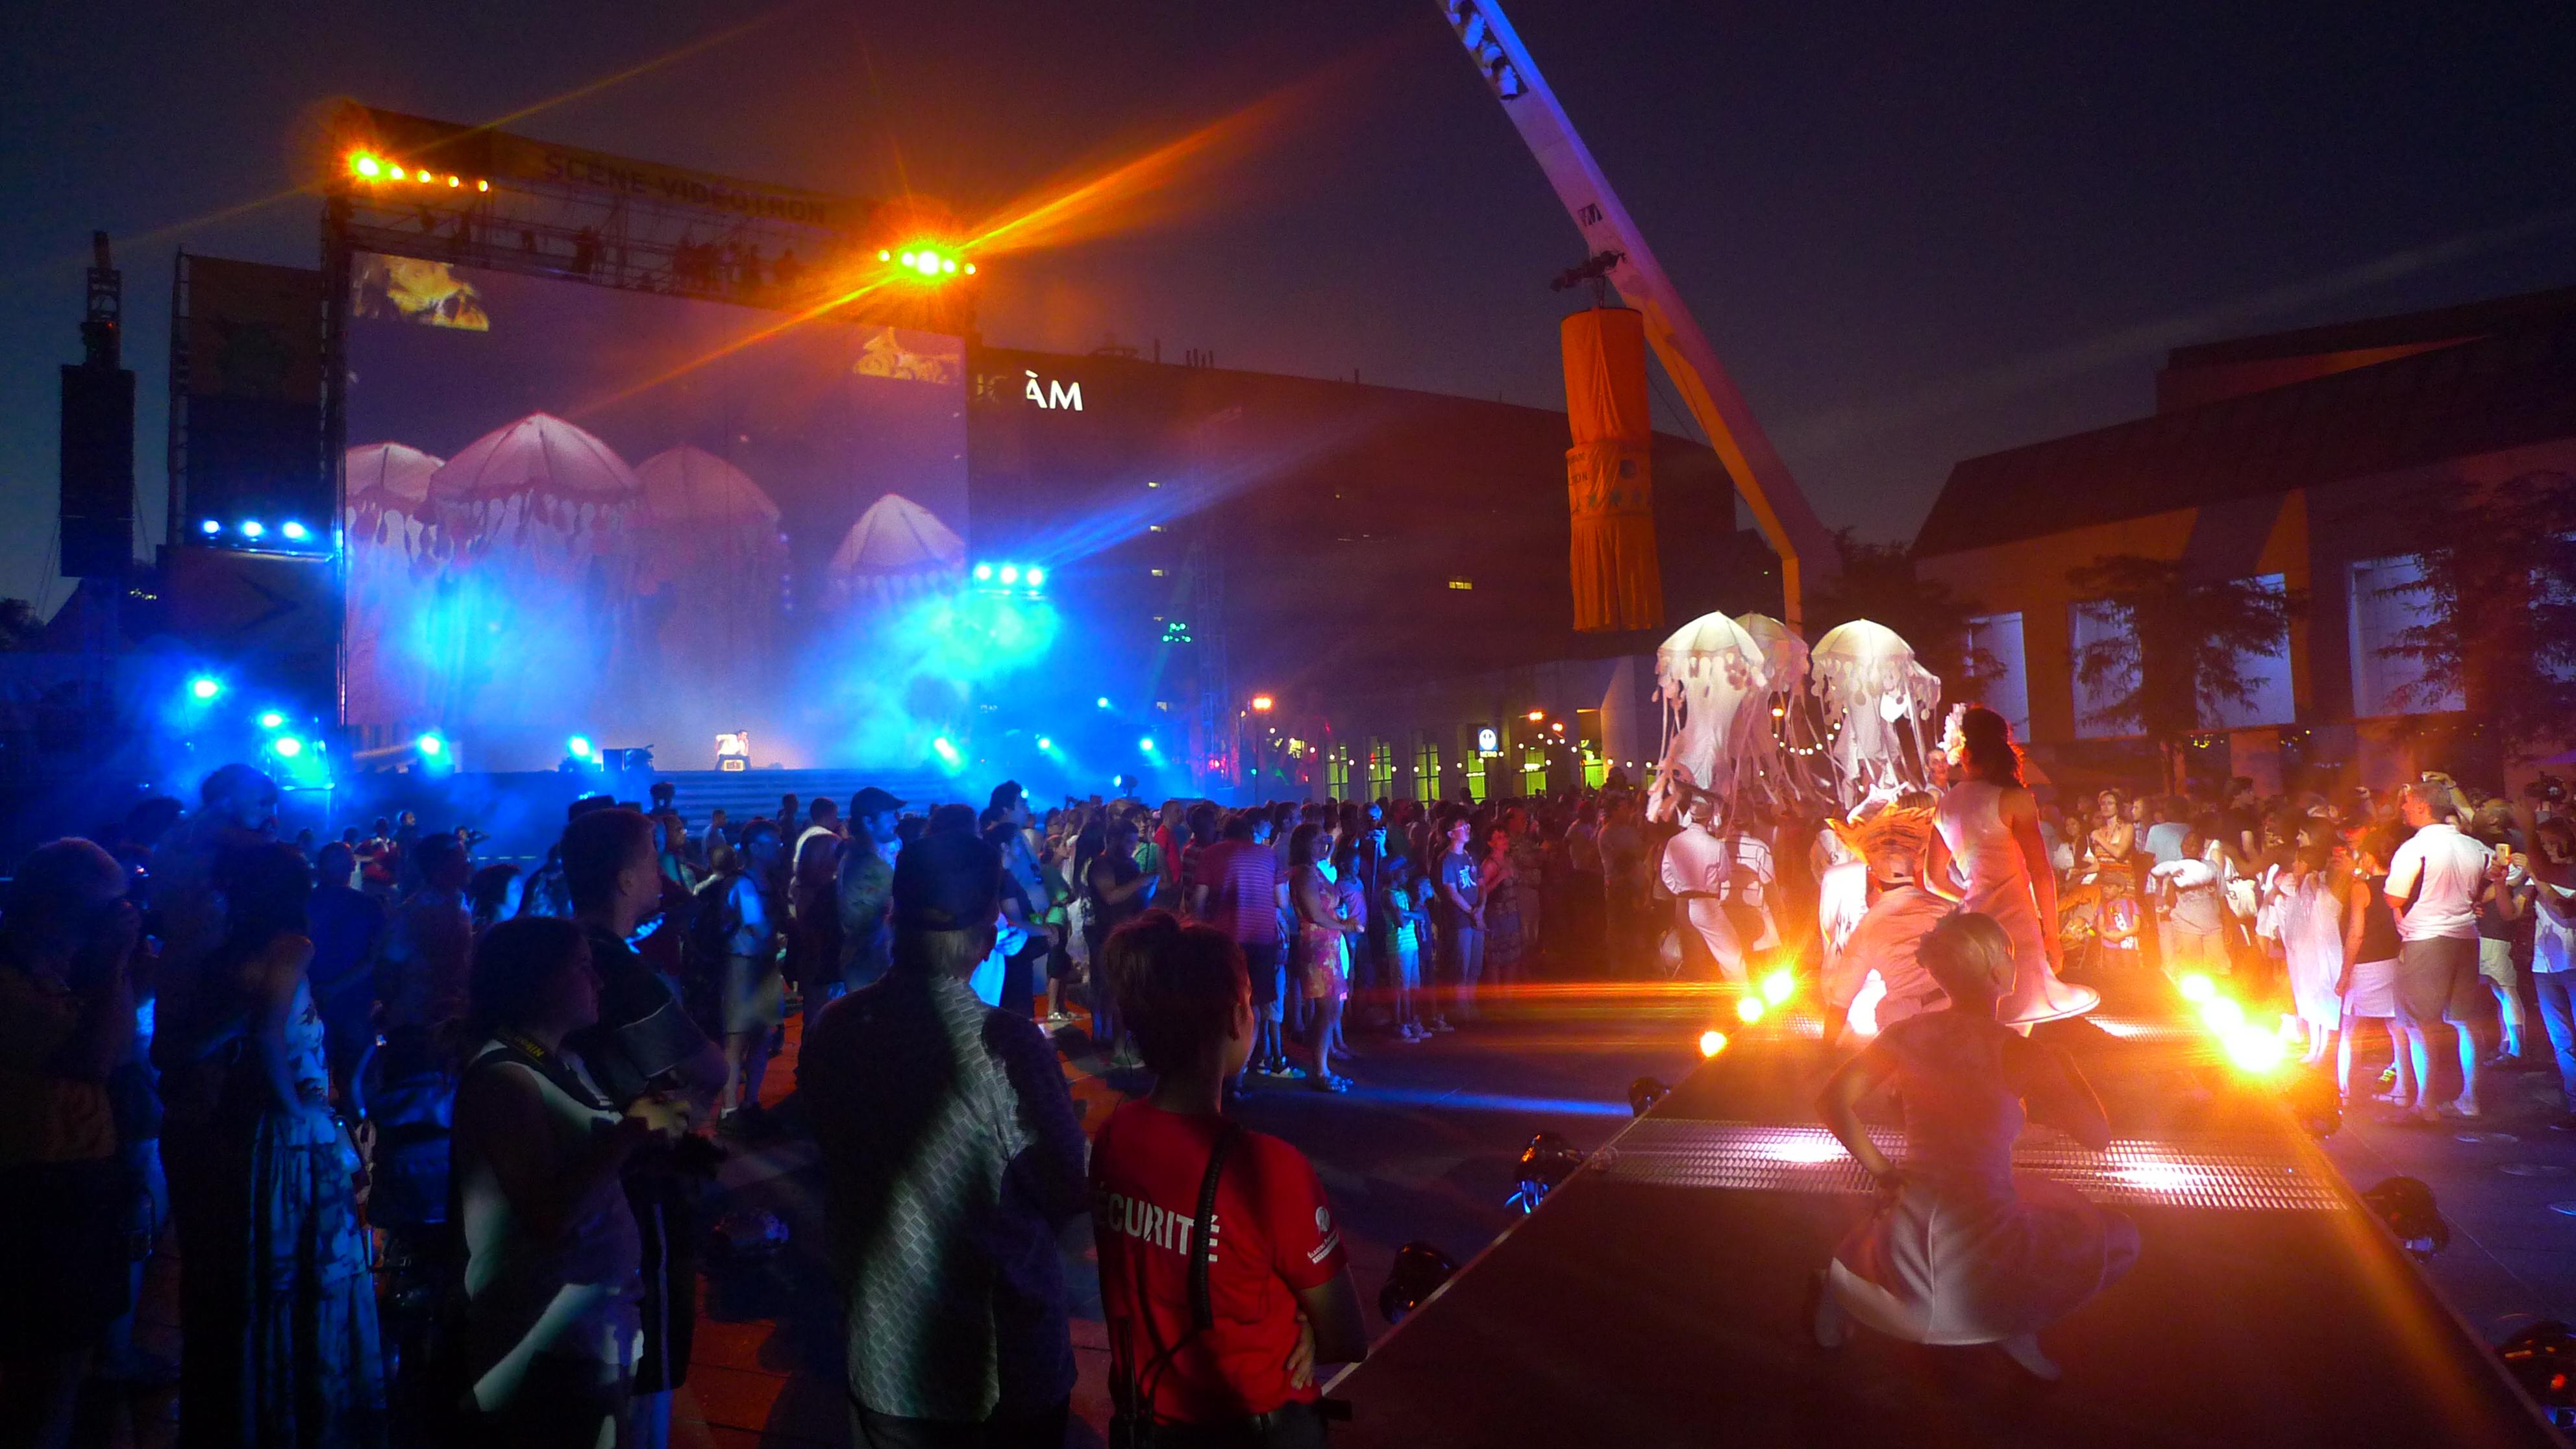 Terra karnaval 2013